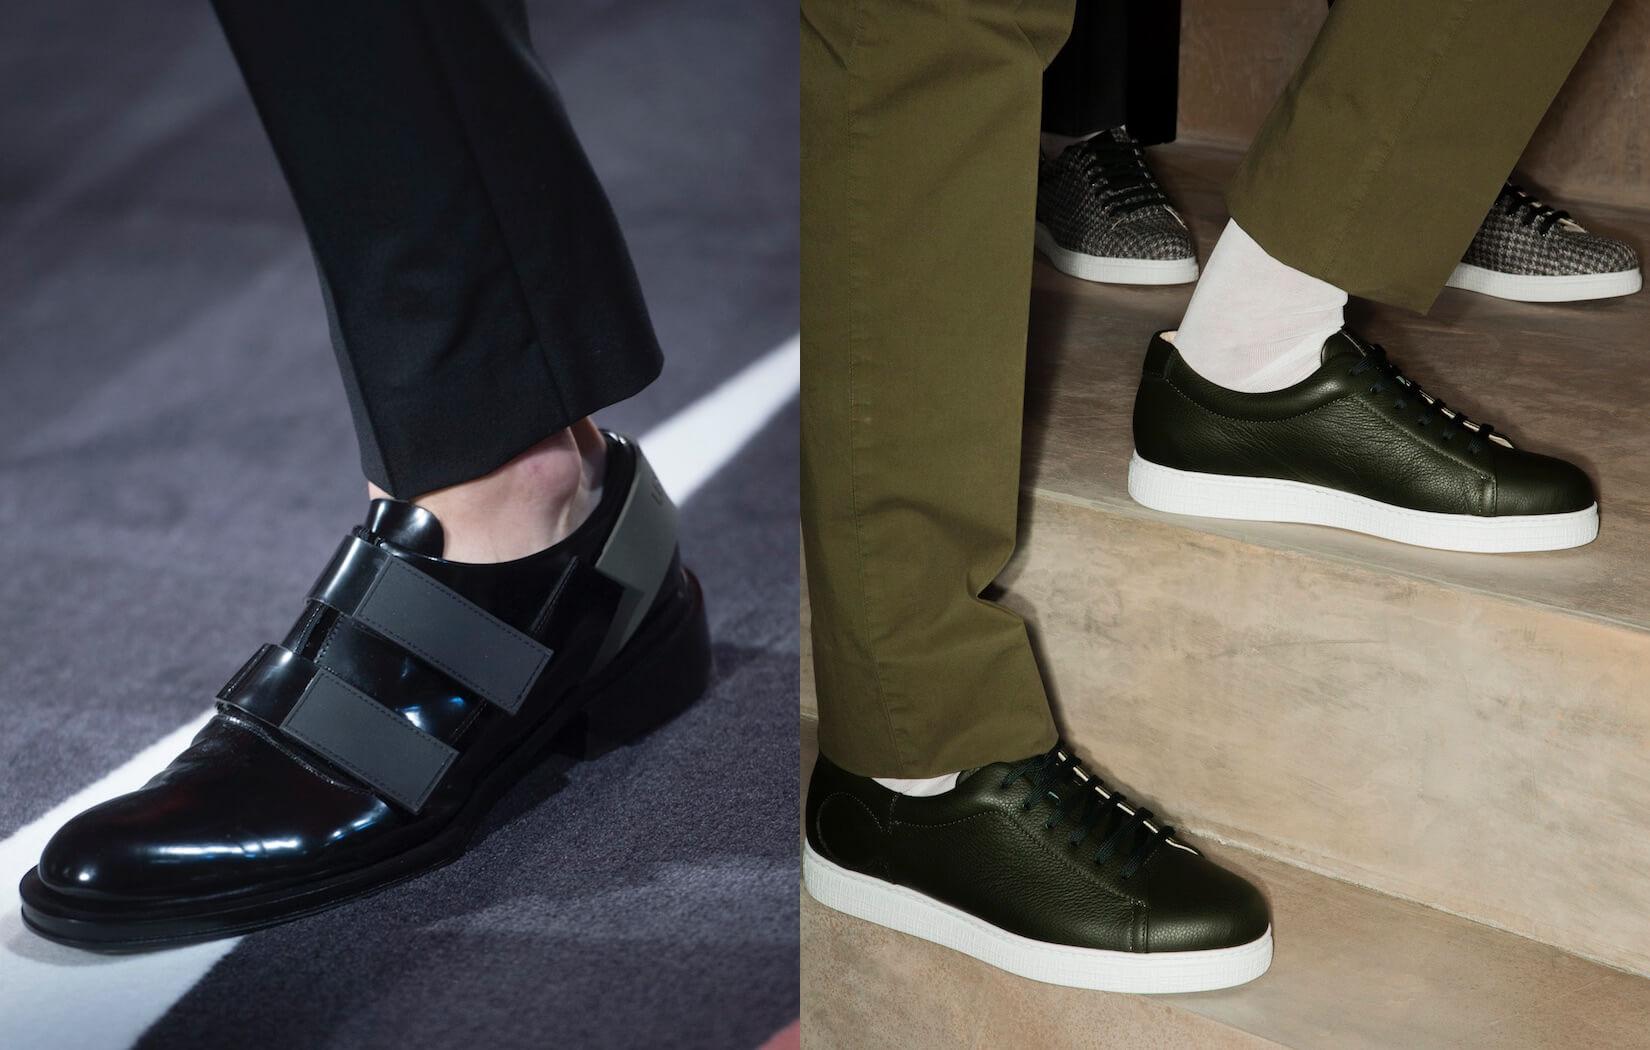 rivenditore di vendita ebae1 59bec Scarpe uomo 2019. Le tendenze: sportive ed eleganti - Moda ...